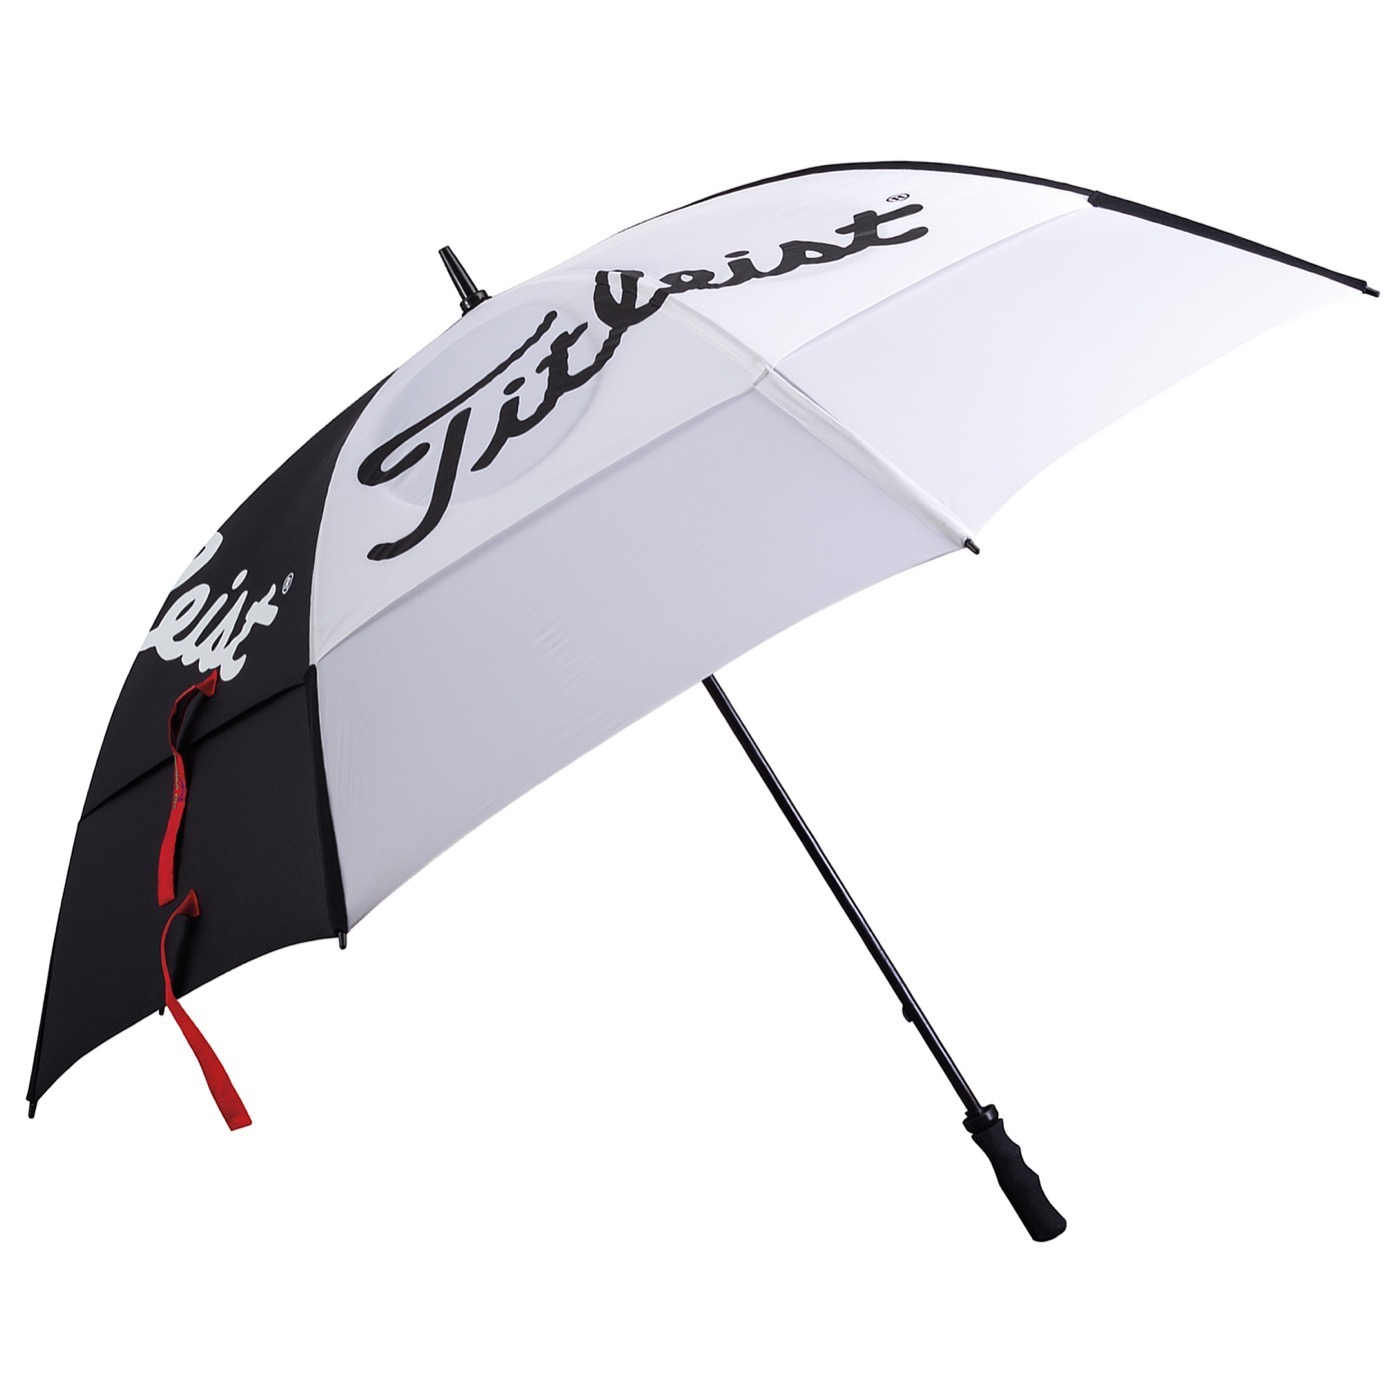 sc 1 st  Scottsdale Golf & Titleist Double Canopy Golf Umbrella | Scottsdale Golf